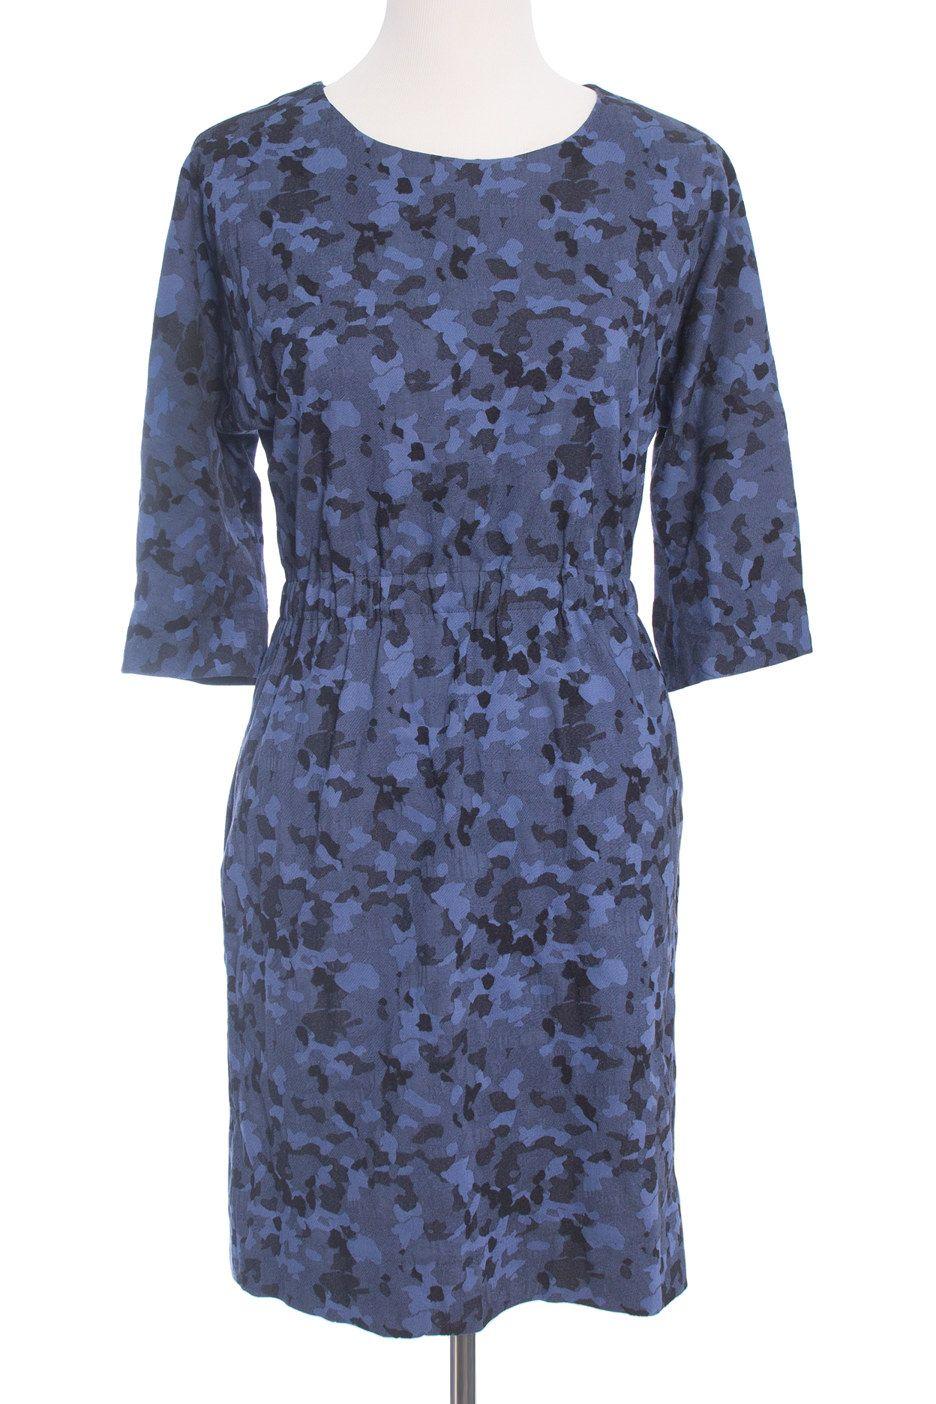 sheath dress sewing pattern by avid seamstress indiesew